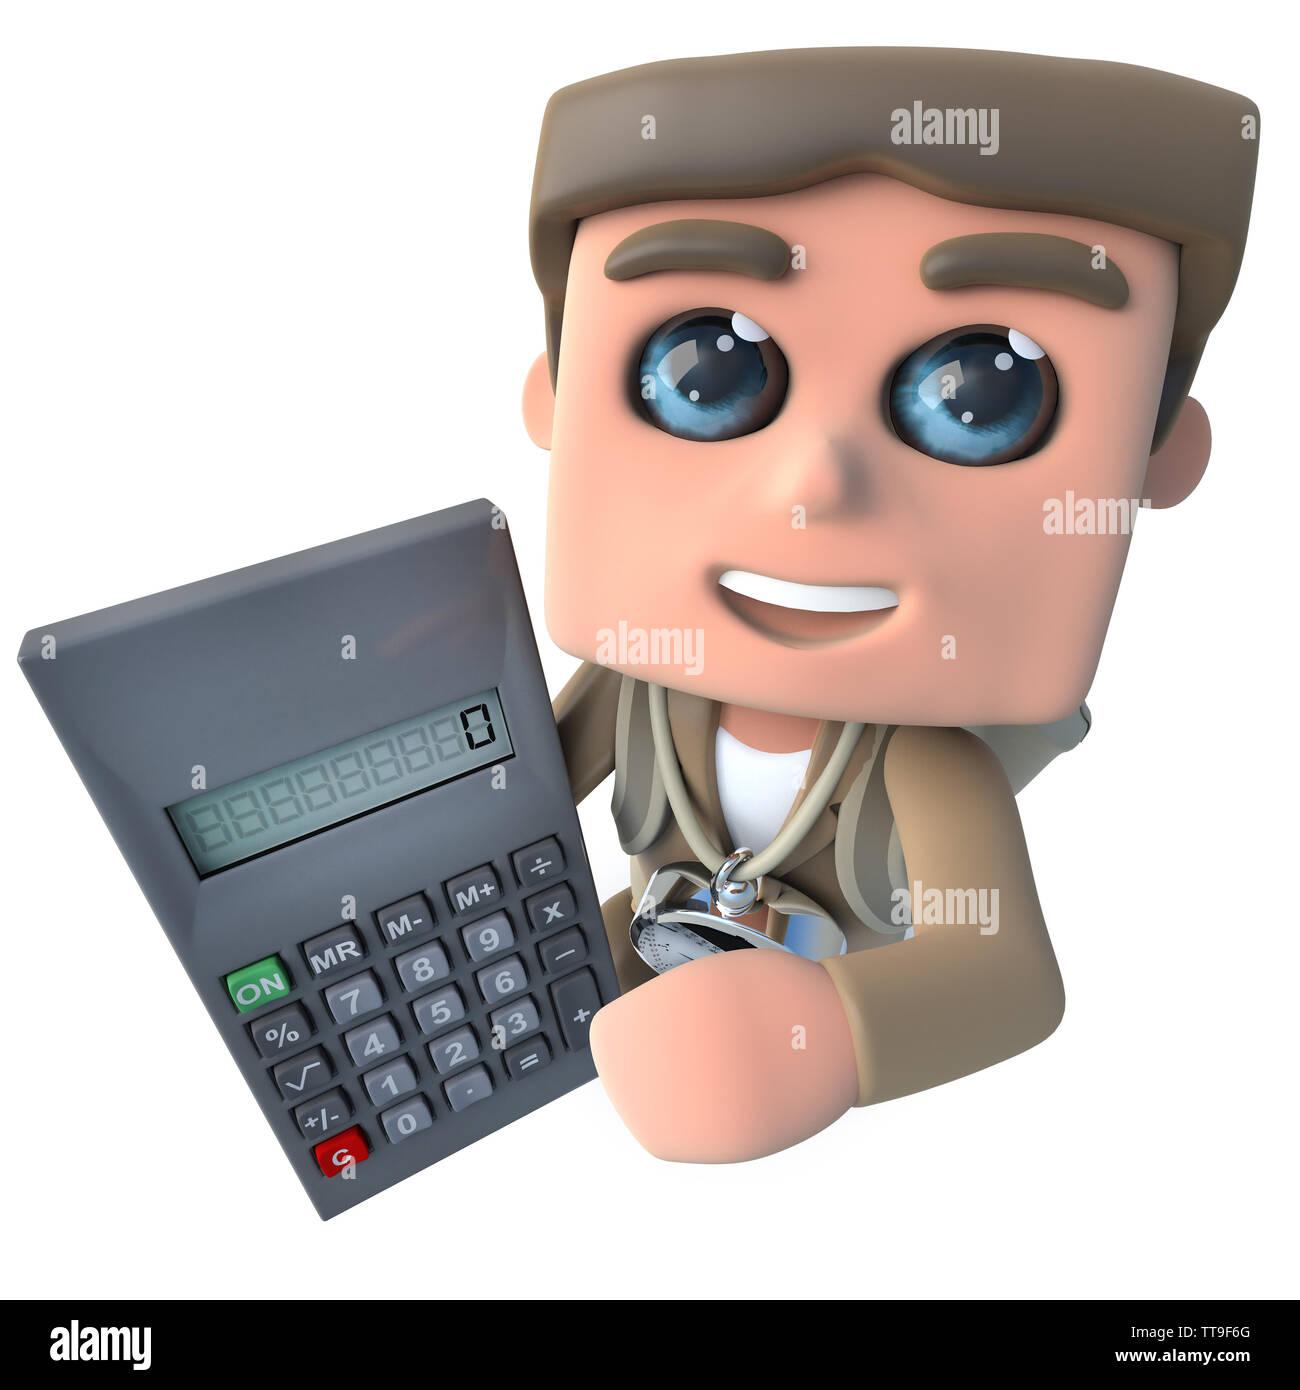 3d render of a funny cartoon explorer adventurer holding a digital calculator - Stock Image